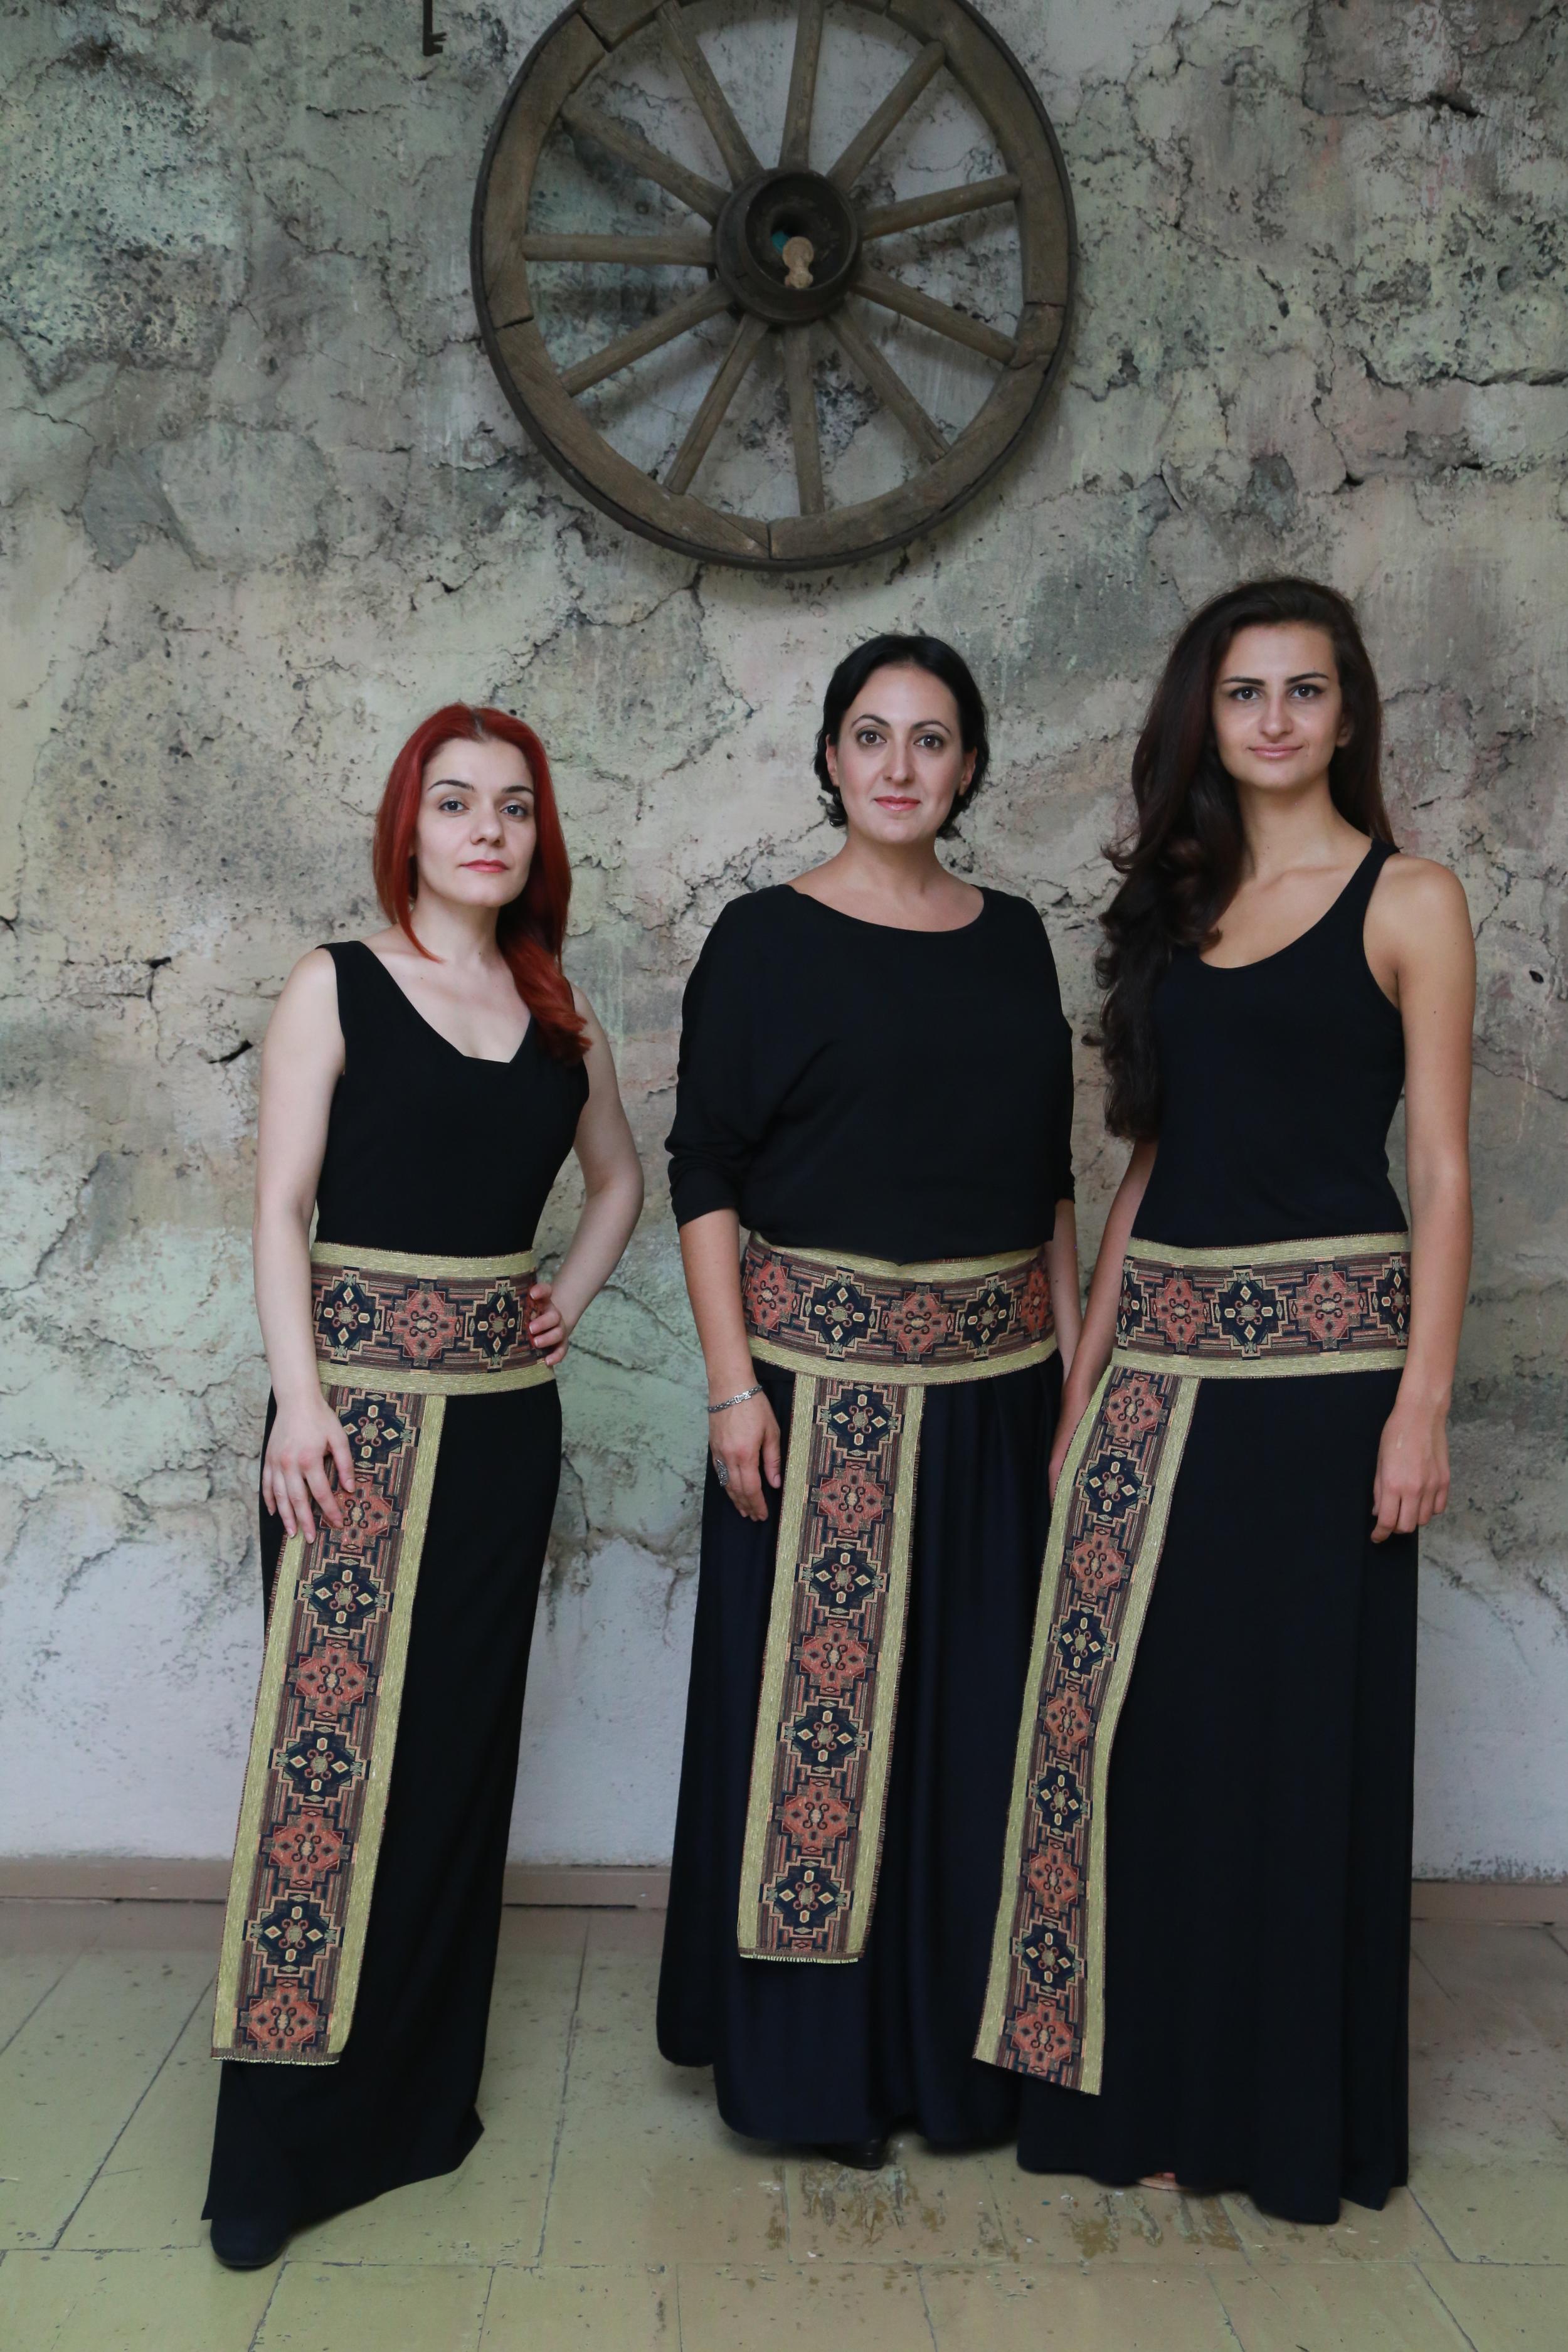 Tatevik Movsesyan - SOPRANO, Hasmik Baghdasaryan - SOPRANO, Arpine Petrosyan - ALTO